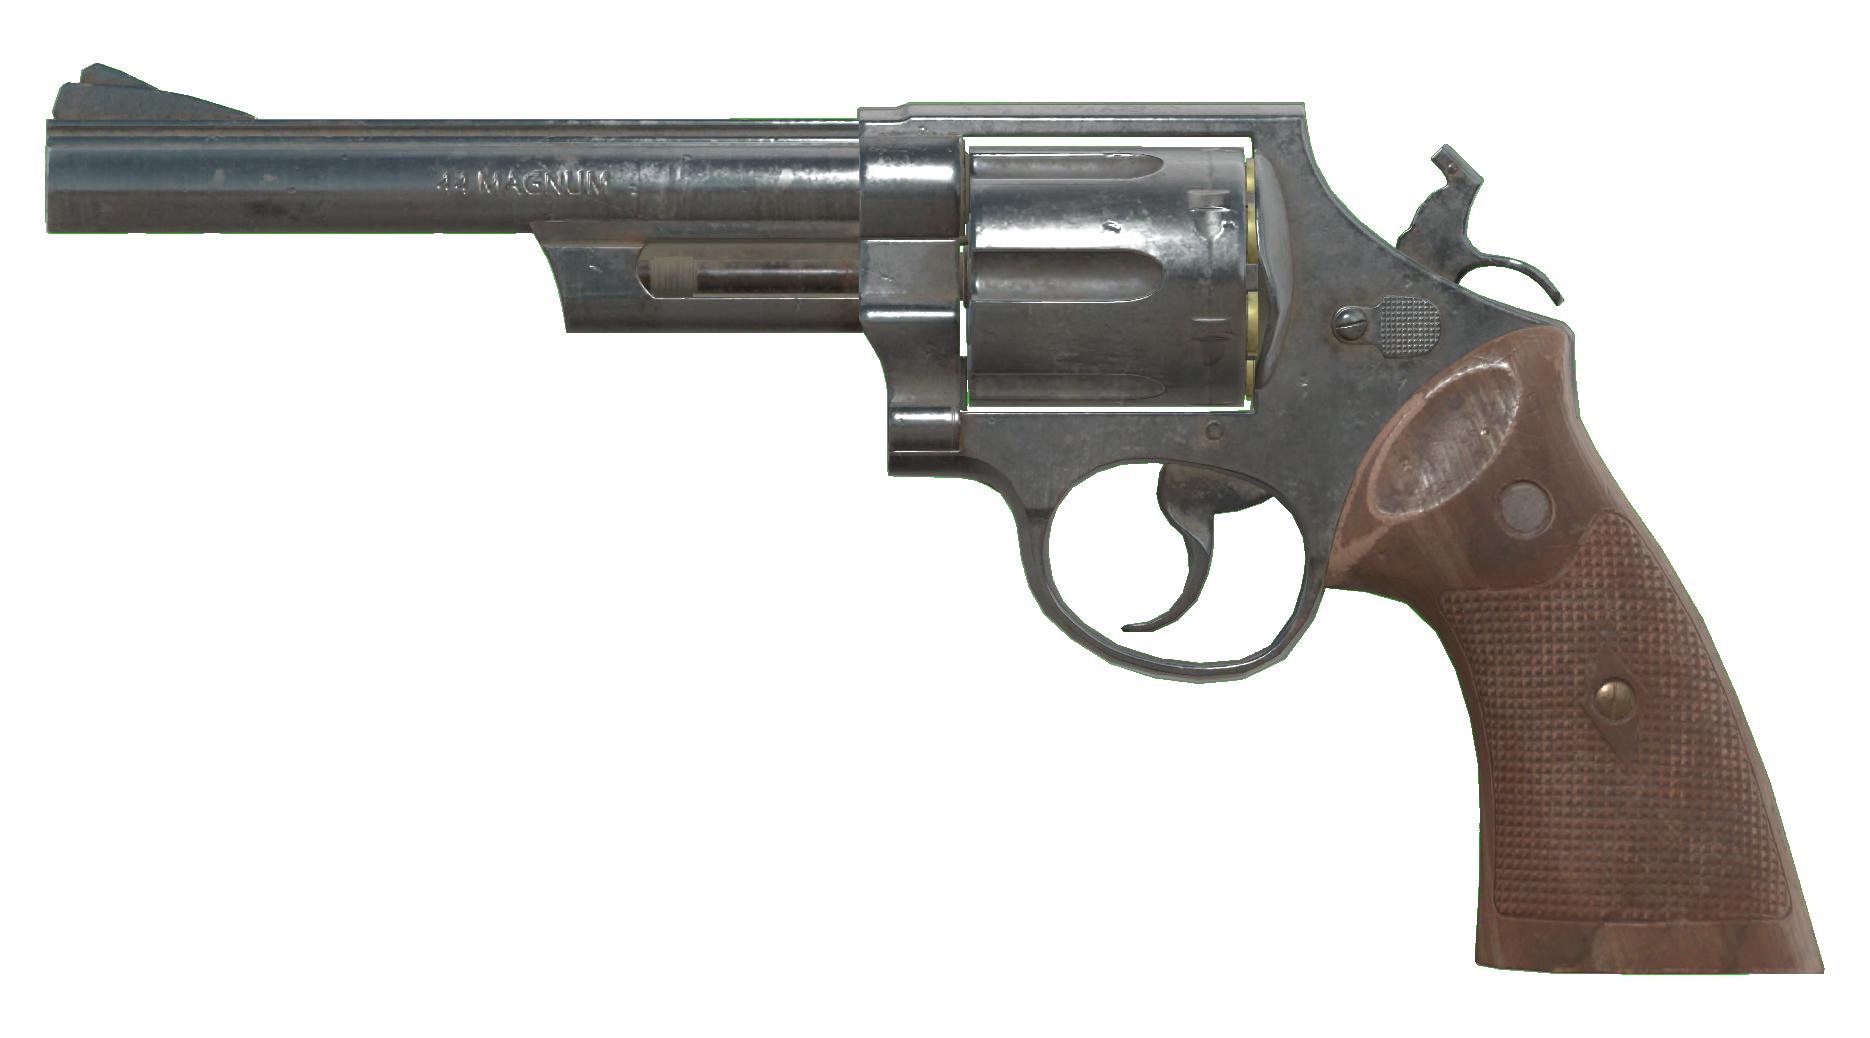 .44 pistol (Fallout 76)